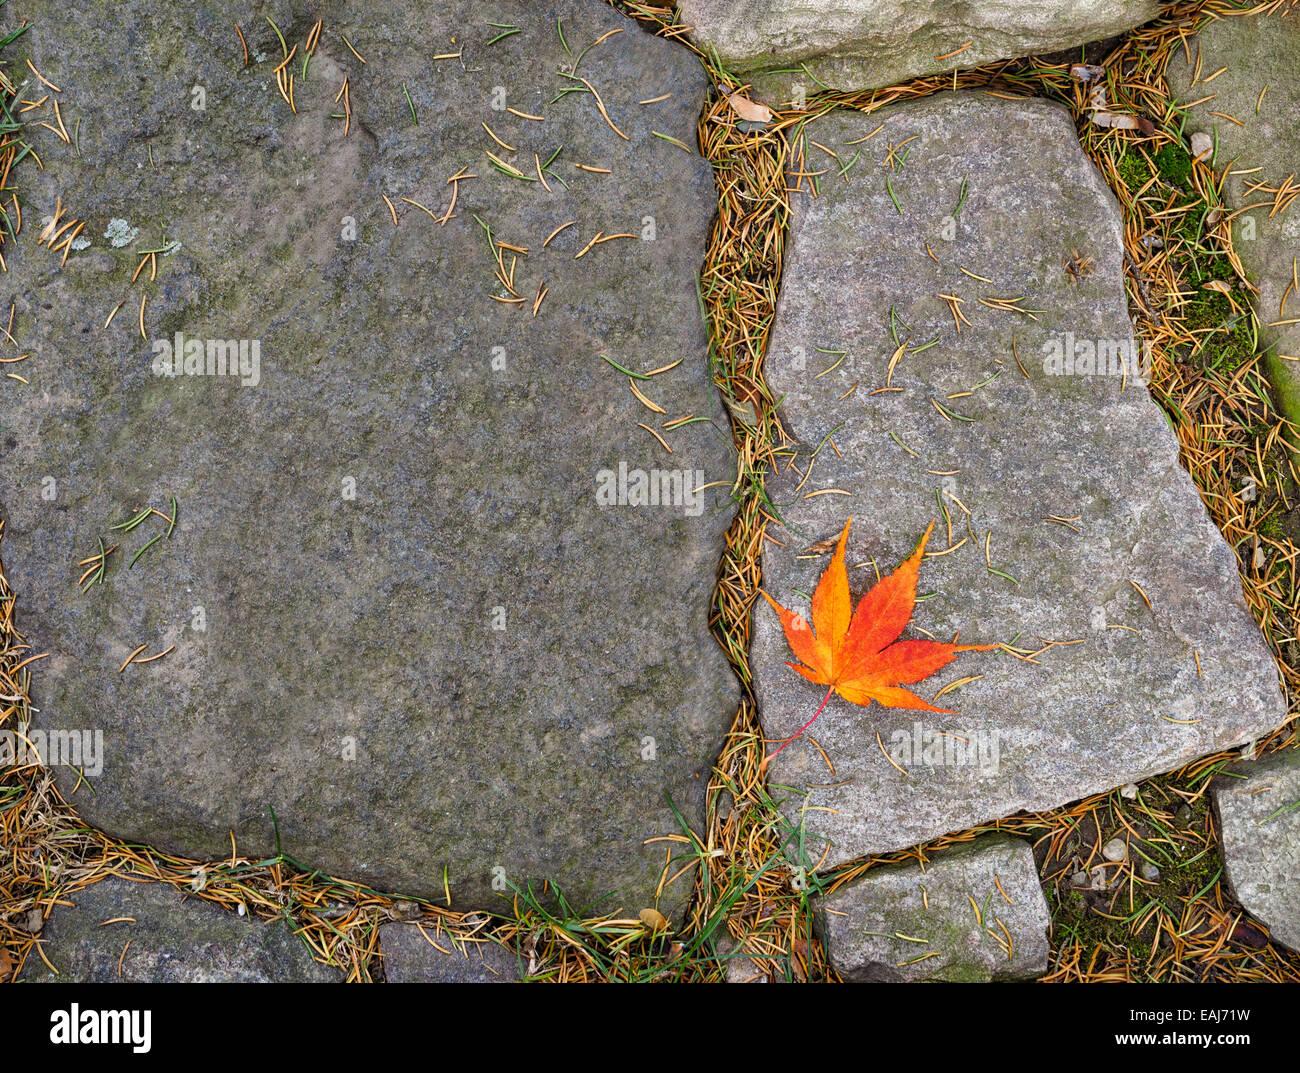 a-single-leaf-gold-red-orange-fall-japanese-maple-leaf-fallen-on-a-EAJ71W.jpg